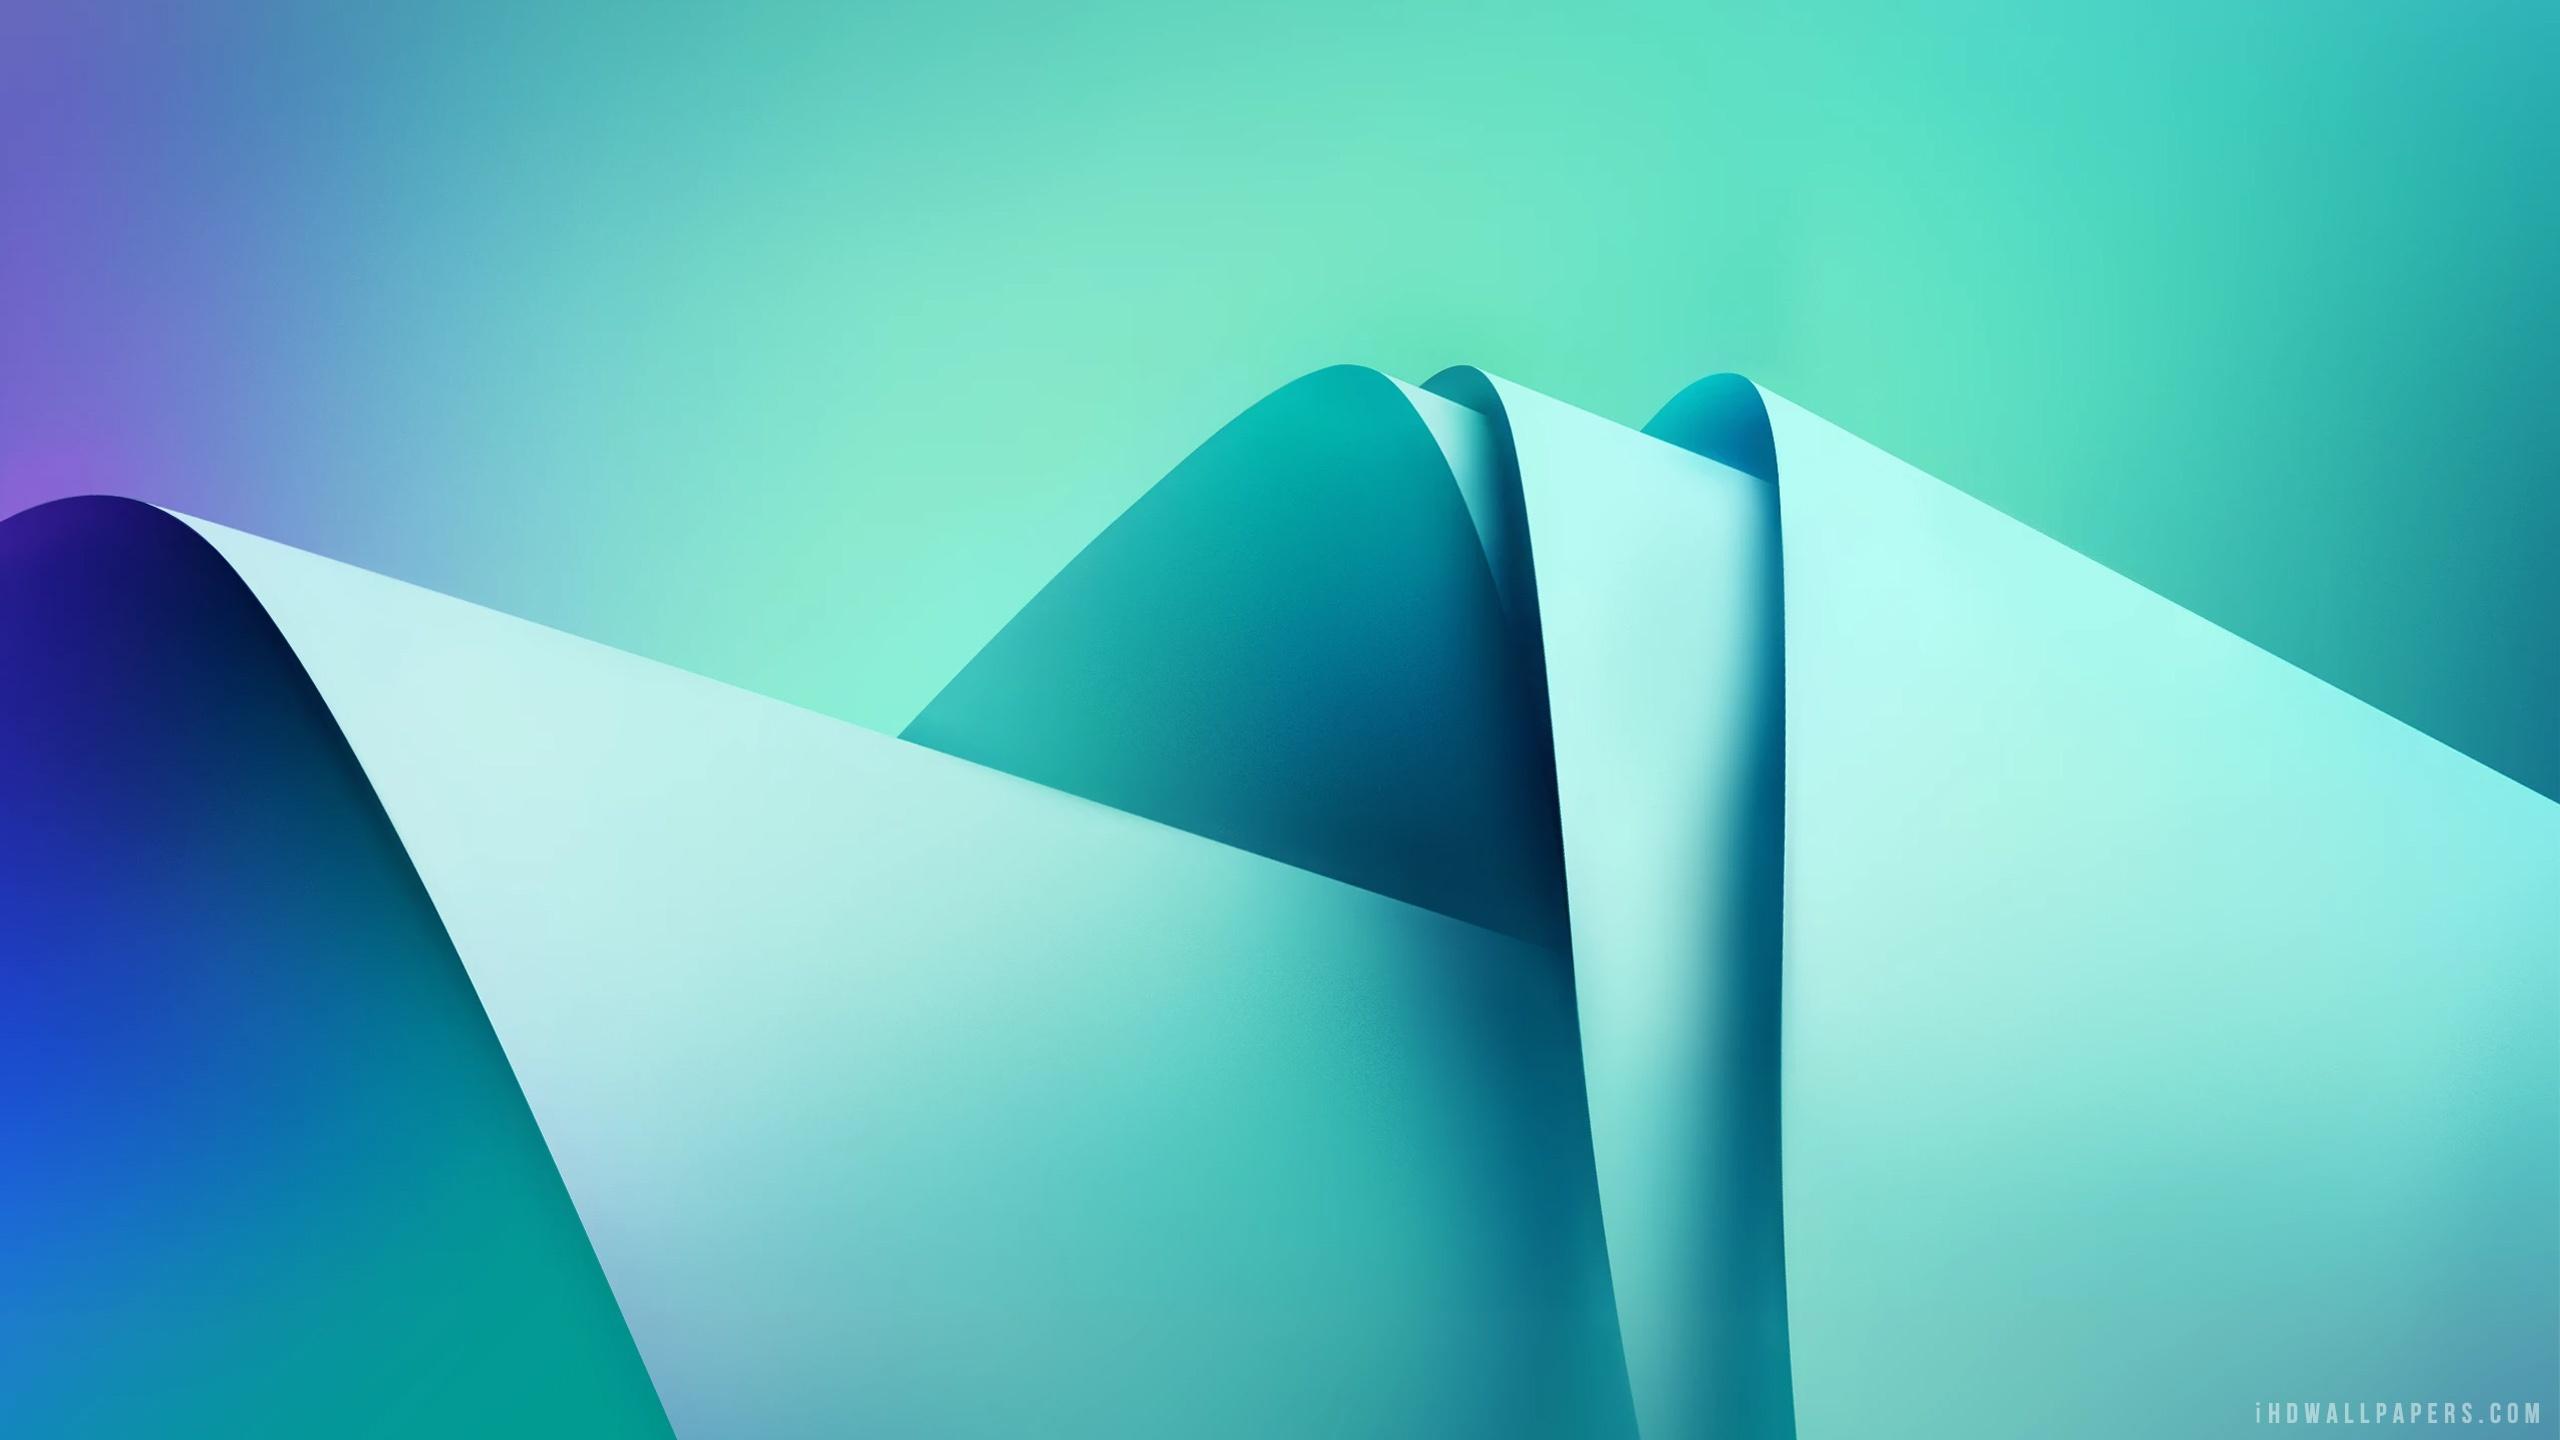 Free Download Galaxy Note 5 Wallpaper Hd Wallpaper Ihd Wallpapers